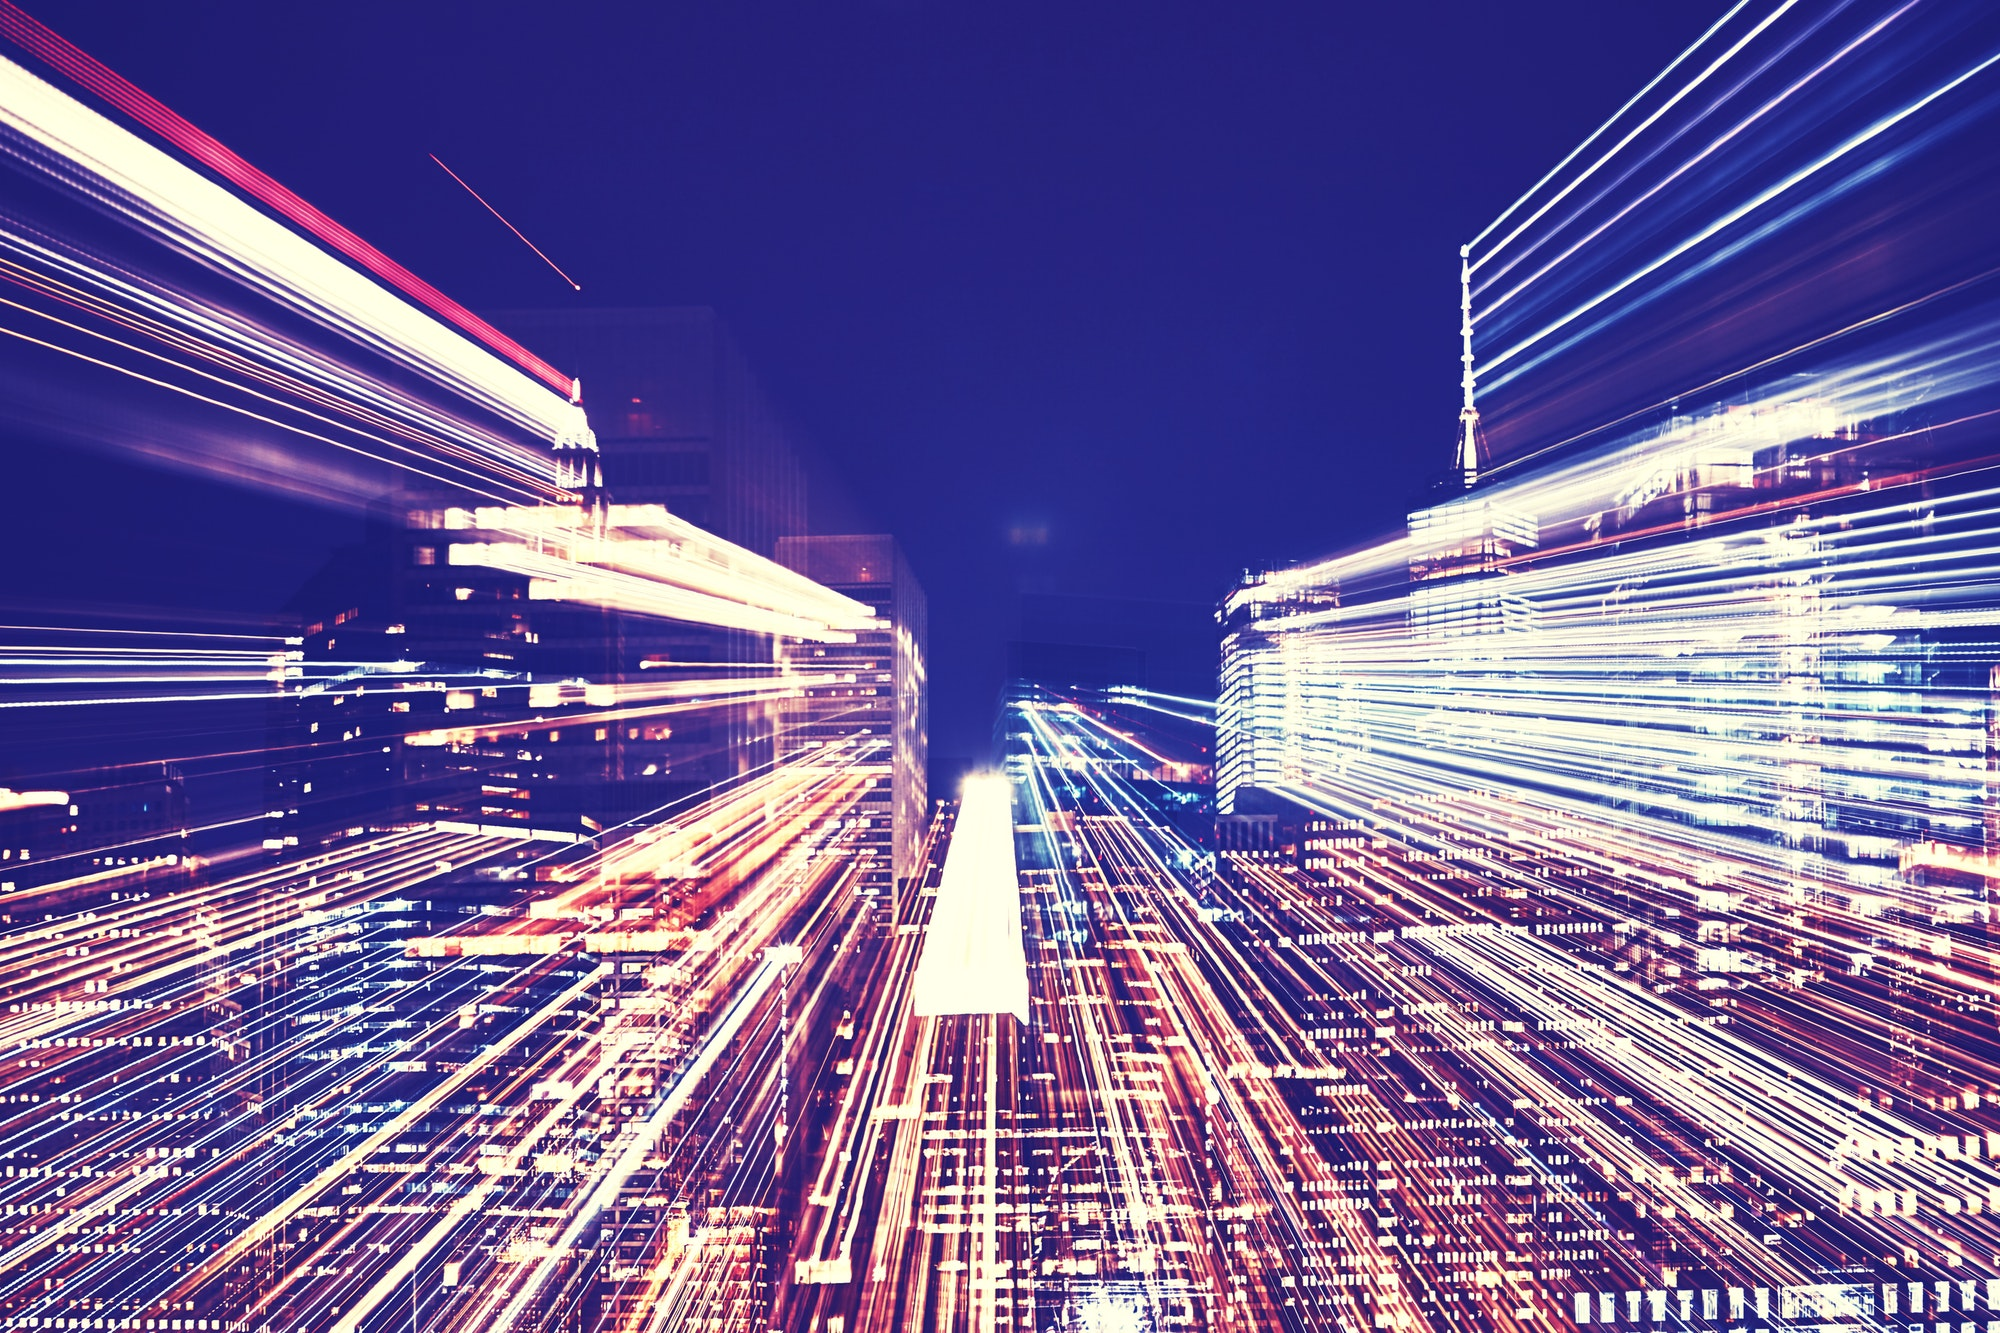 New York City night skyline with futuristic zoom effect.